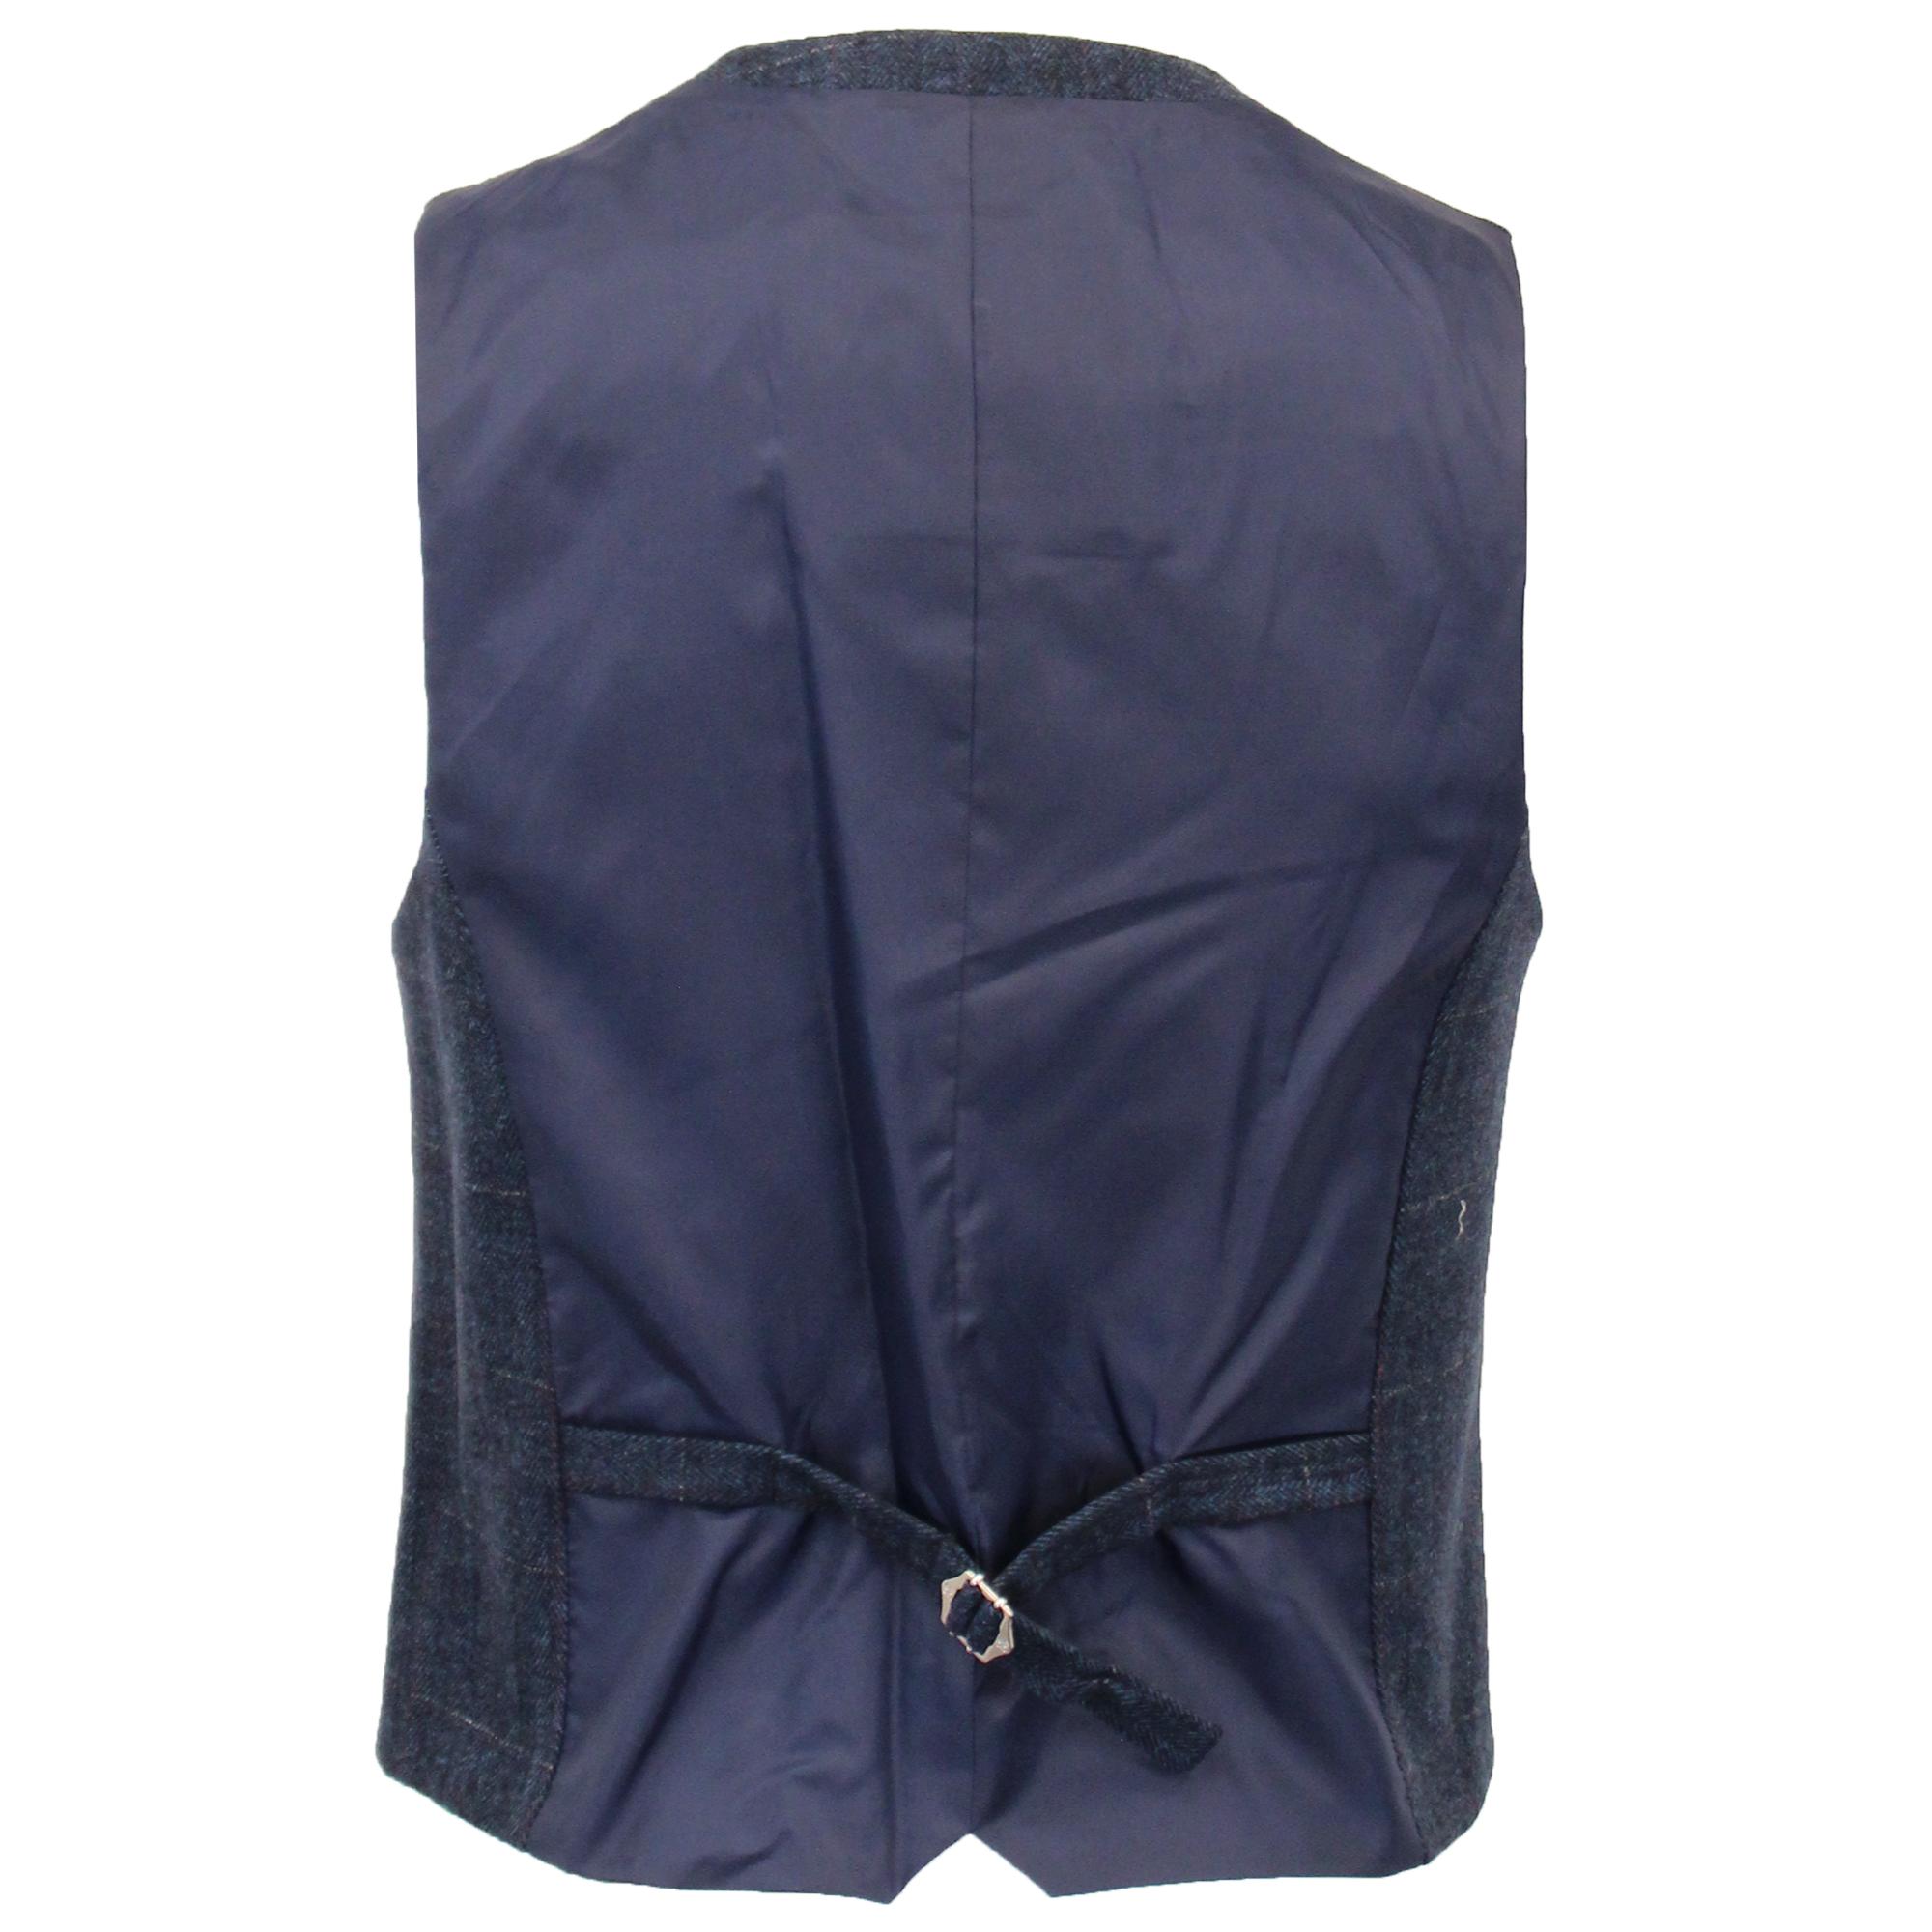 Mens-Wool-Mix-3-Piece-Tweed-Suit-Cavani-CARNEGI-Checked-Peaky-Blinders-Party-New thumbnail 8